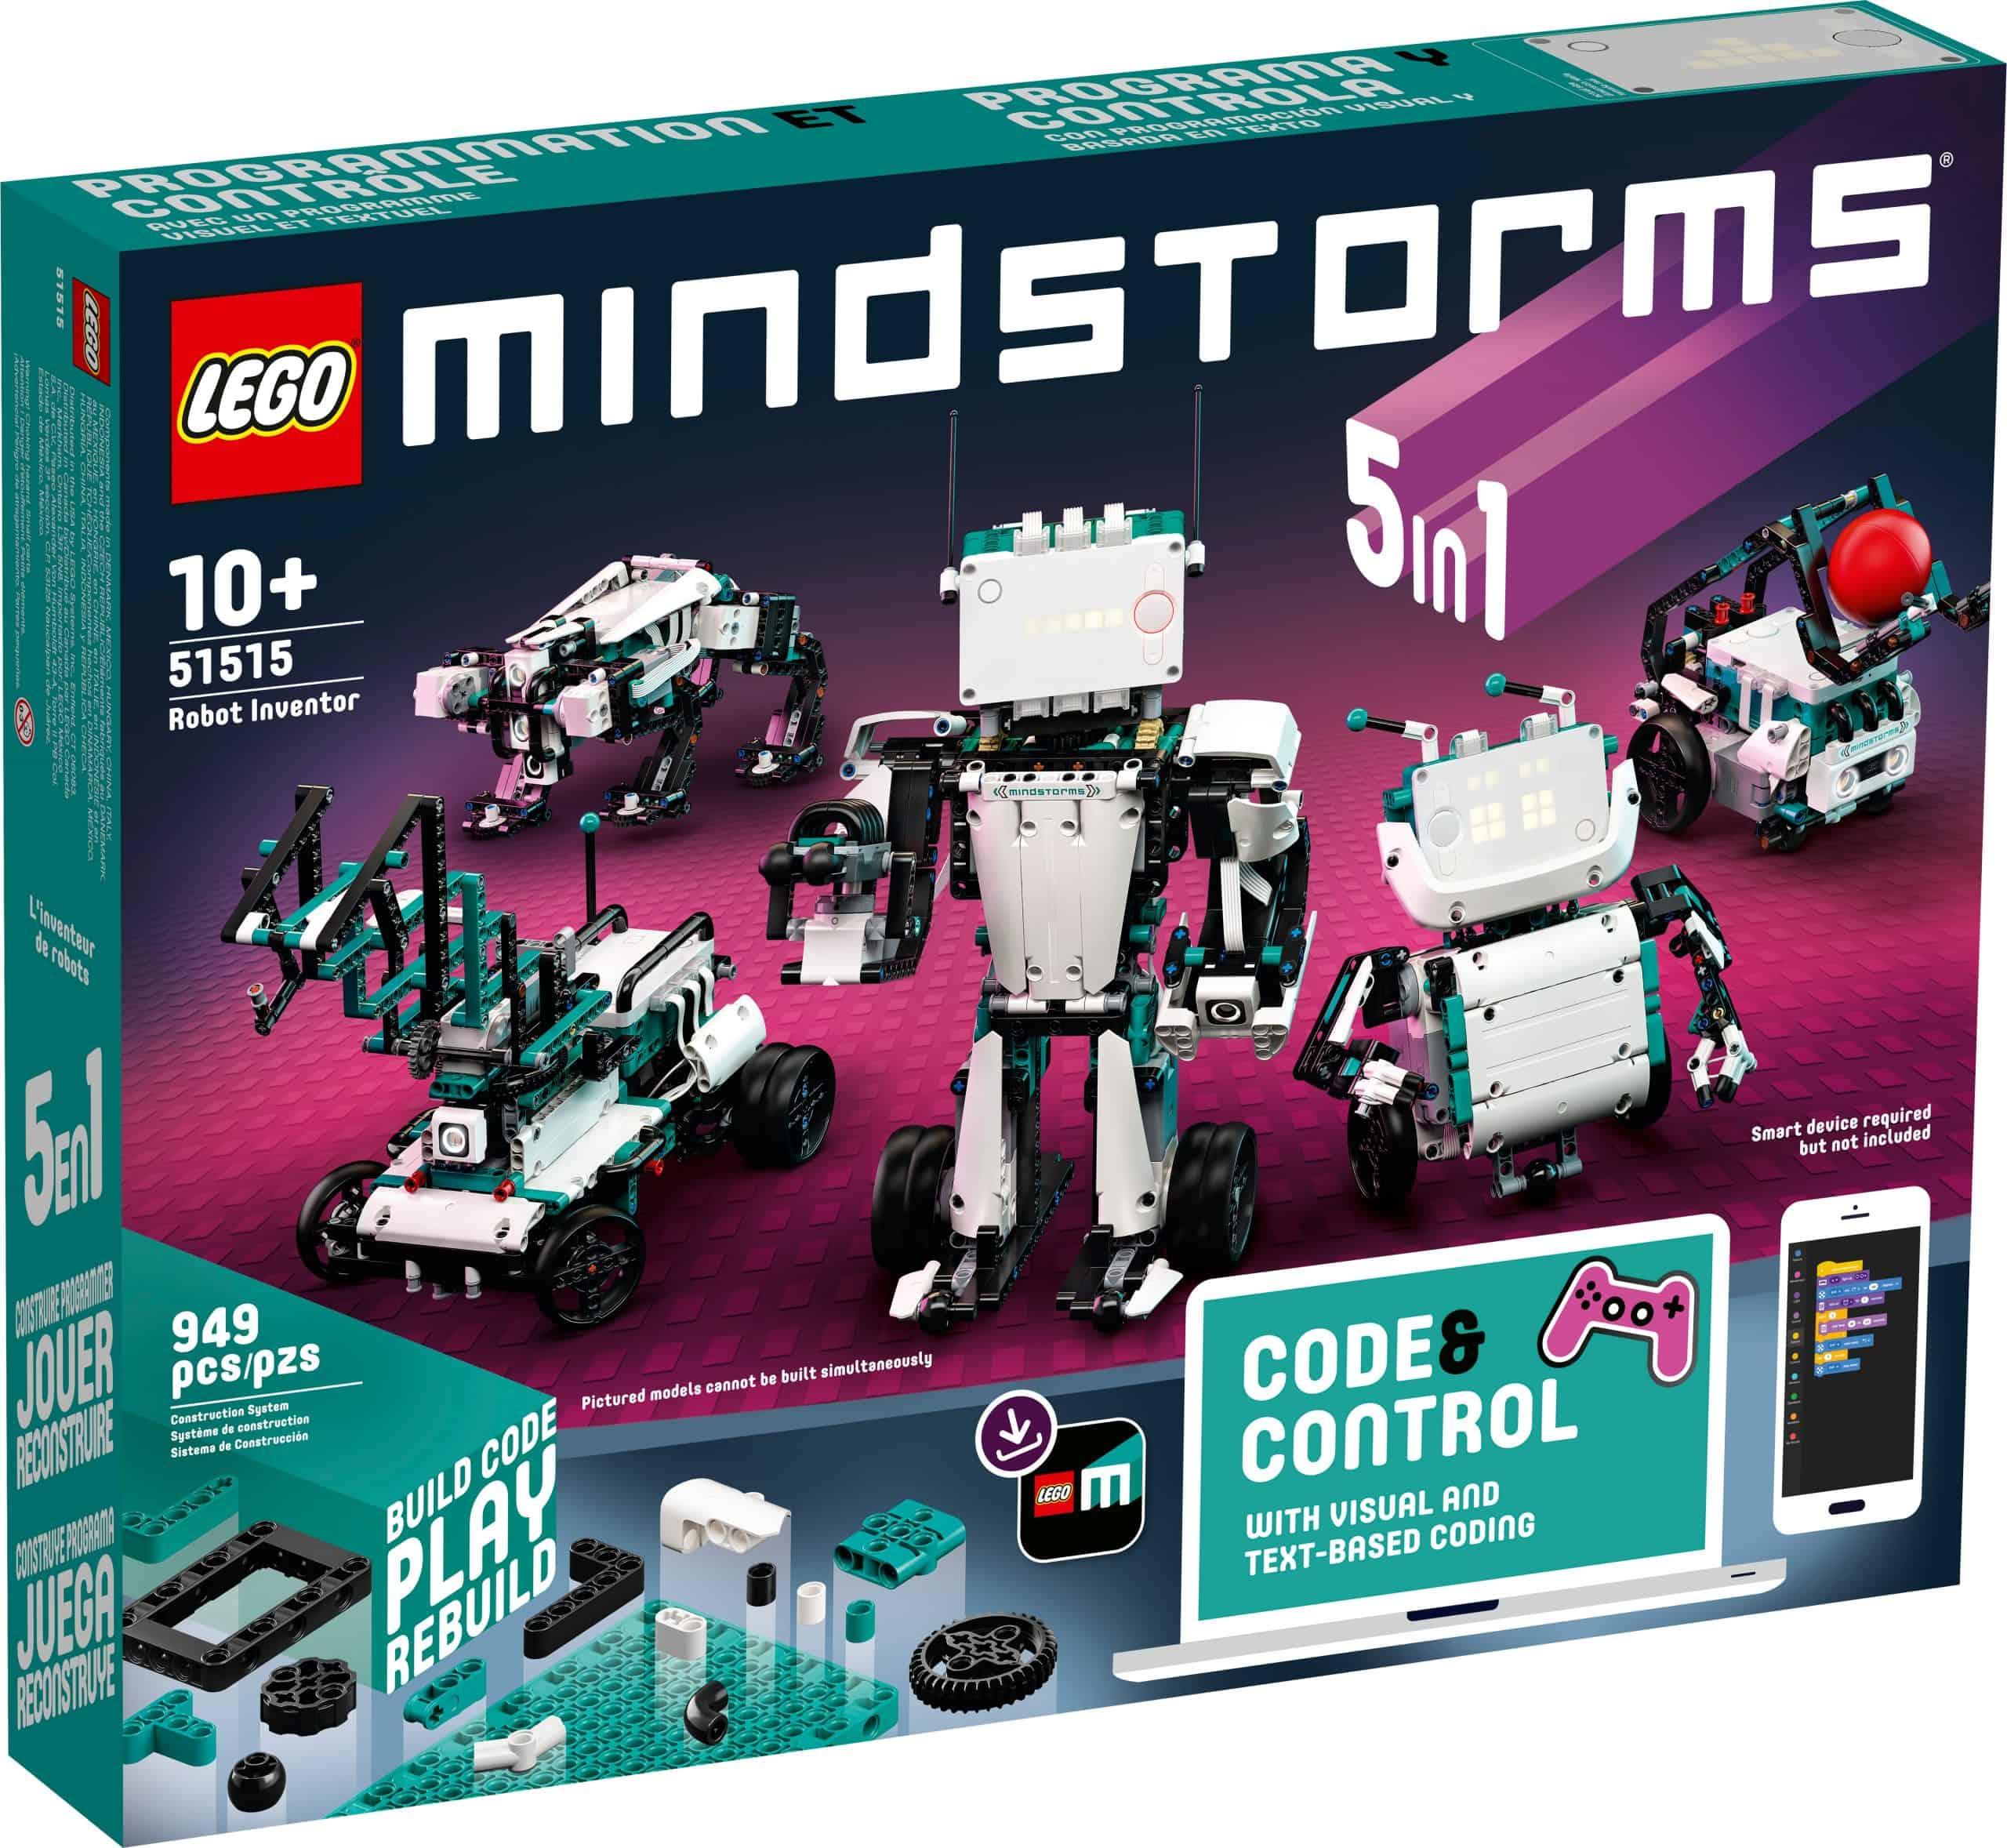 lego 51515 robot inventor scaled